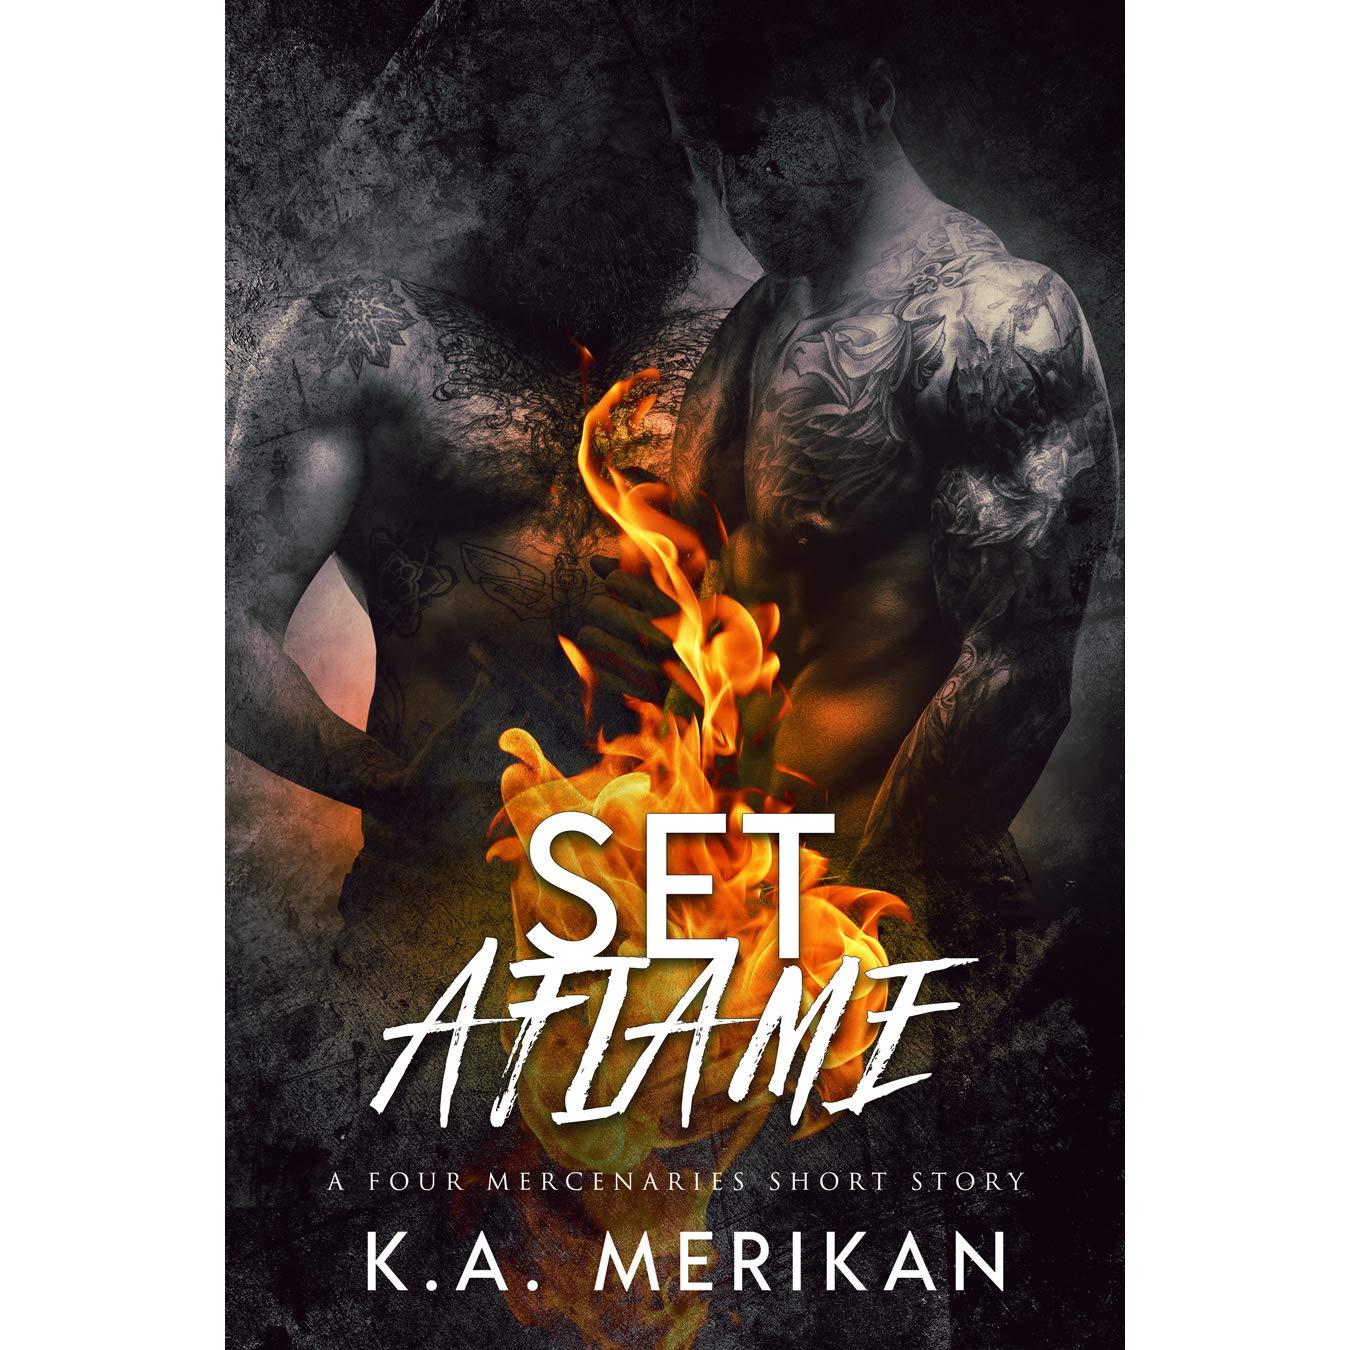 Set Aflame (Four Mercenaries, #2.5) by K.A. Merikan.